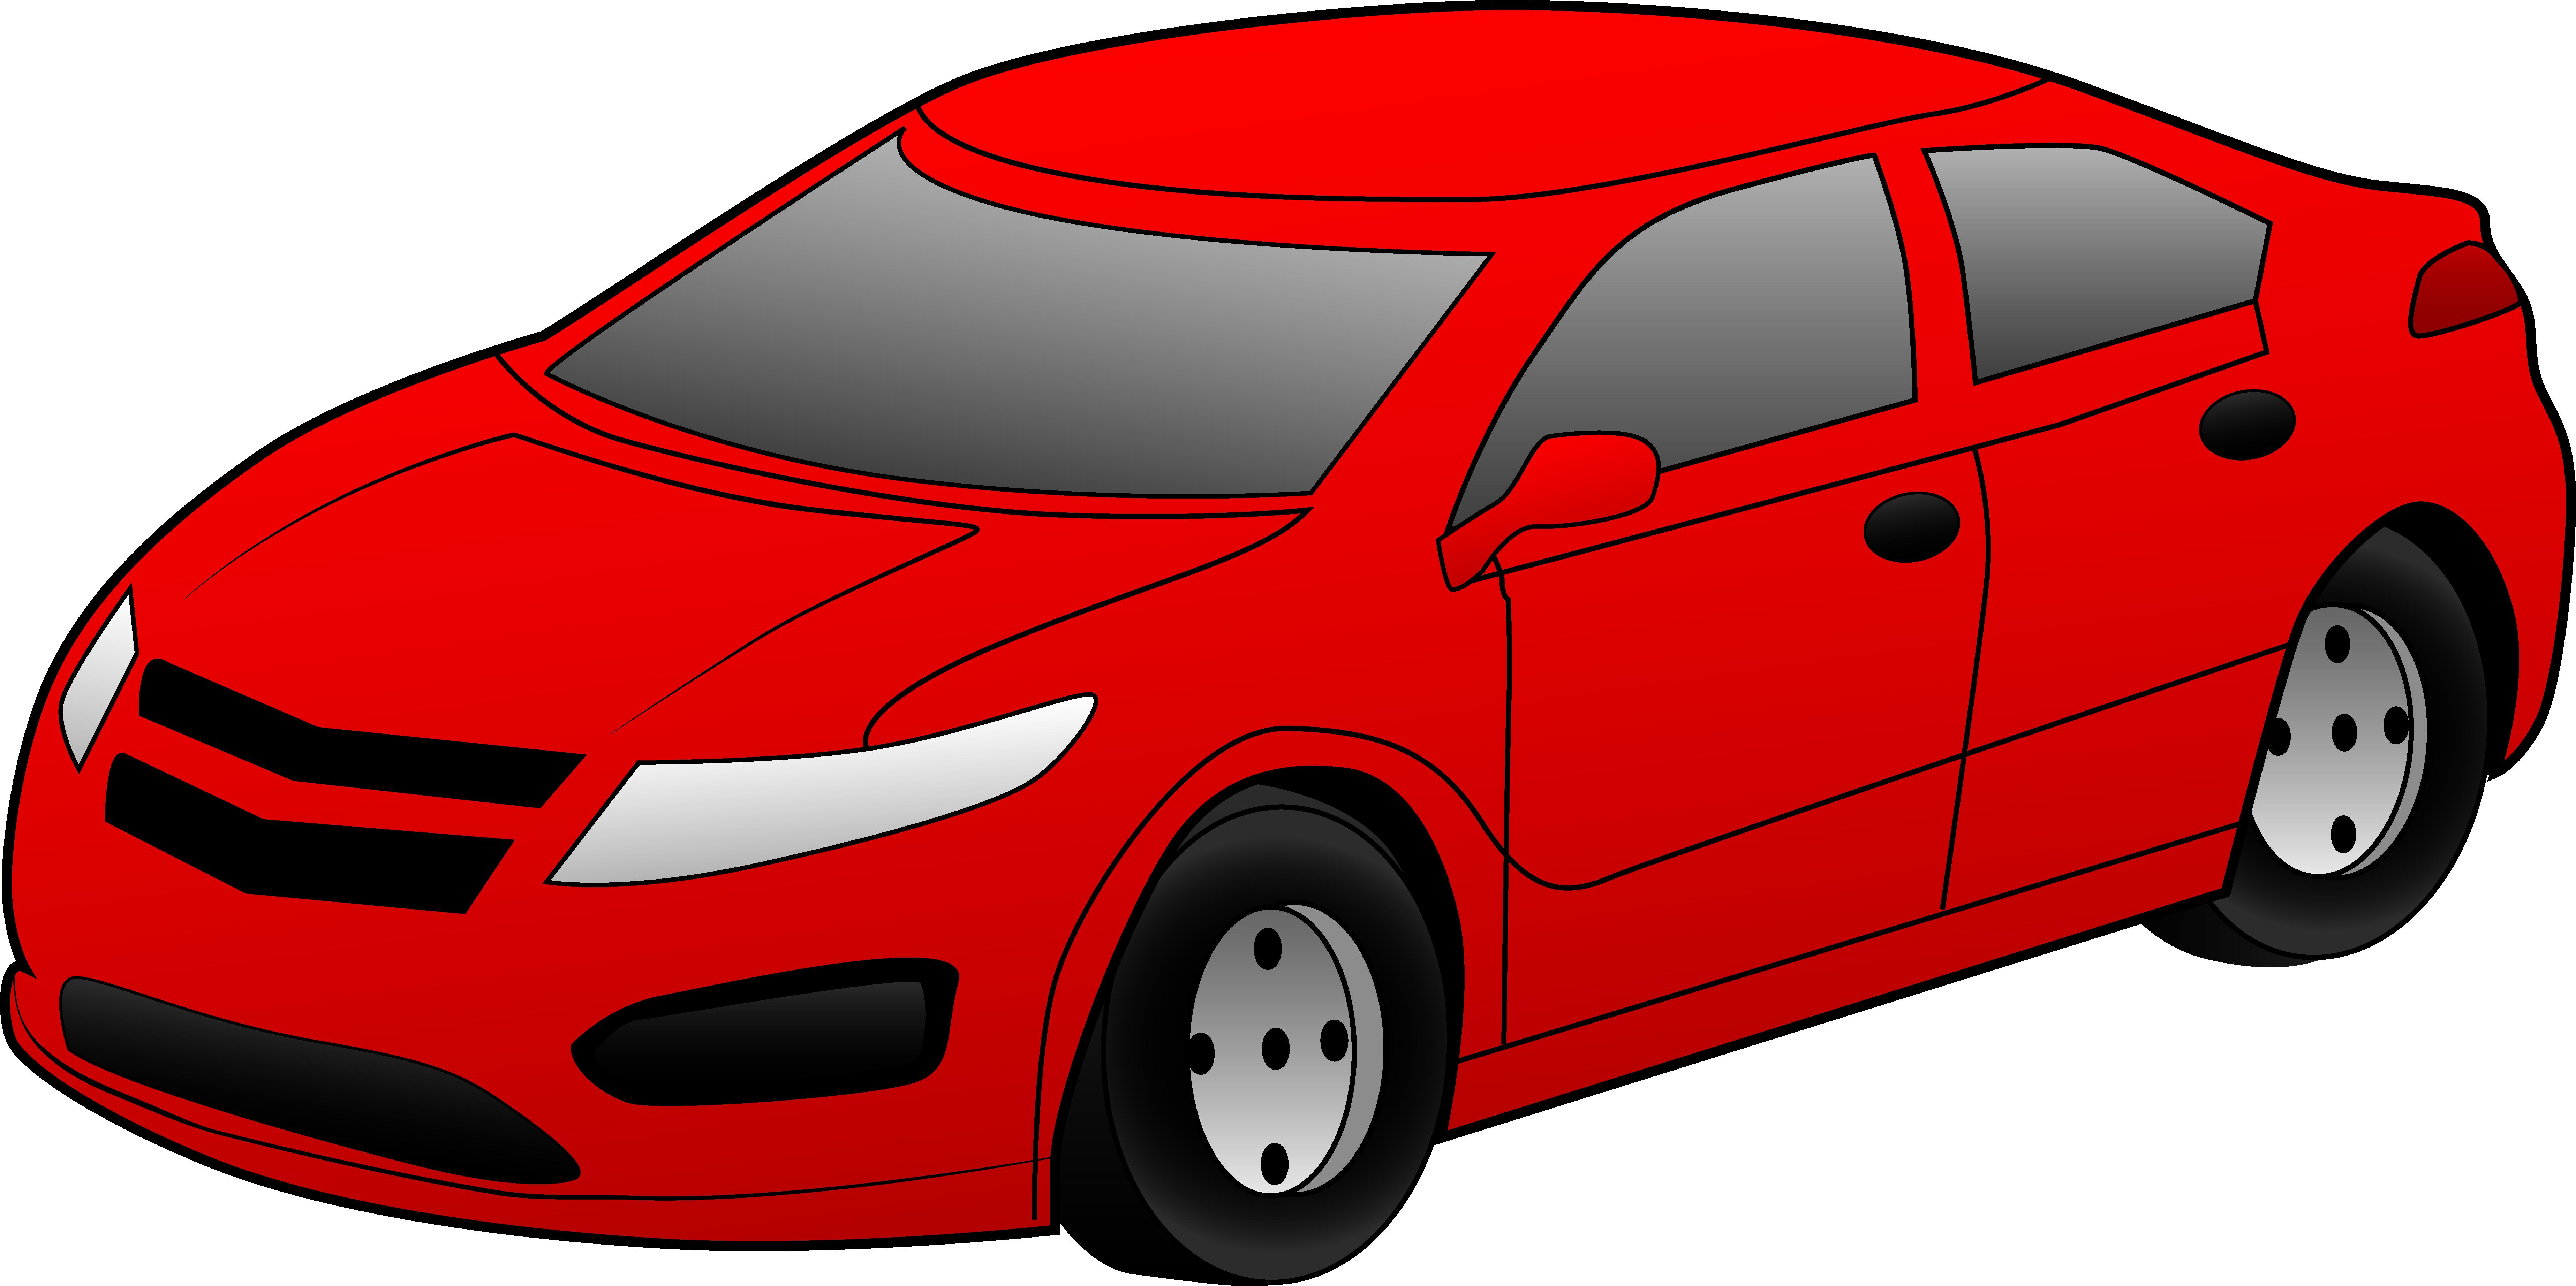 Car clipart #18, Download drawings